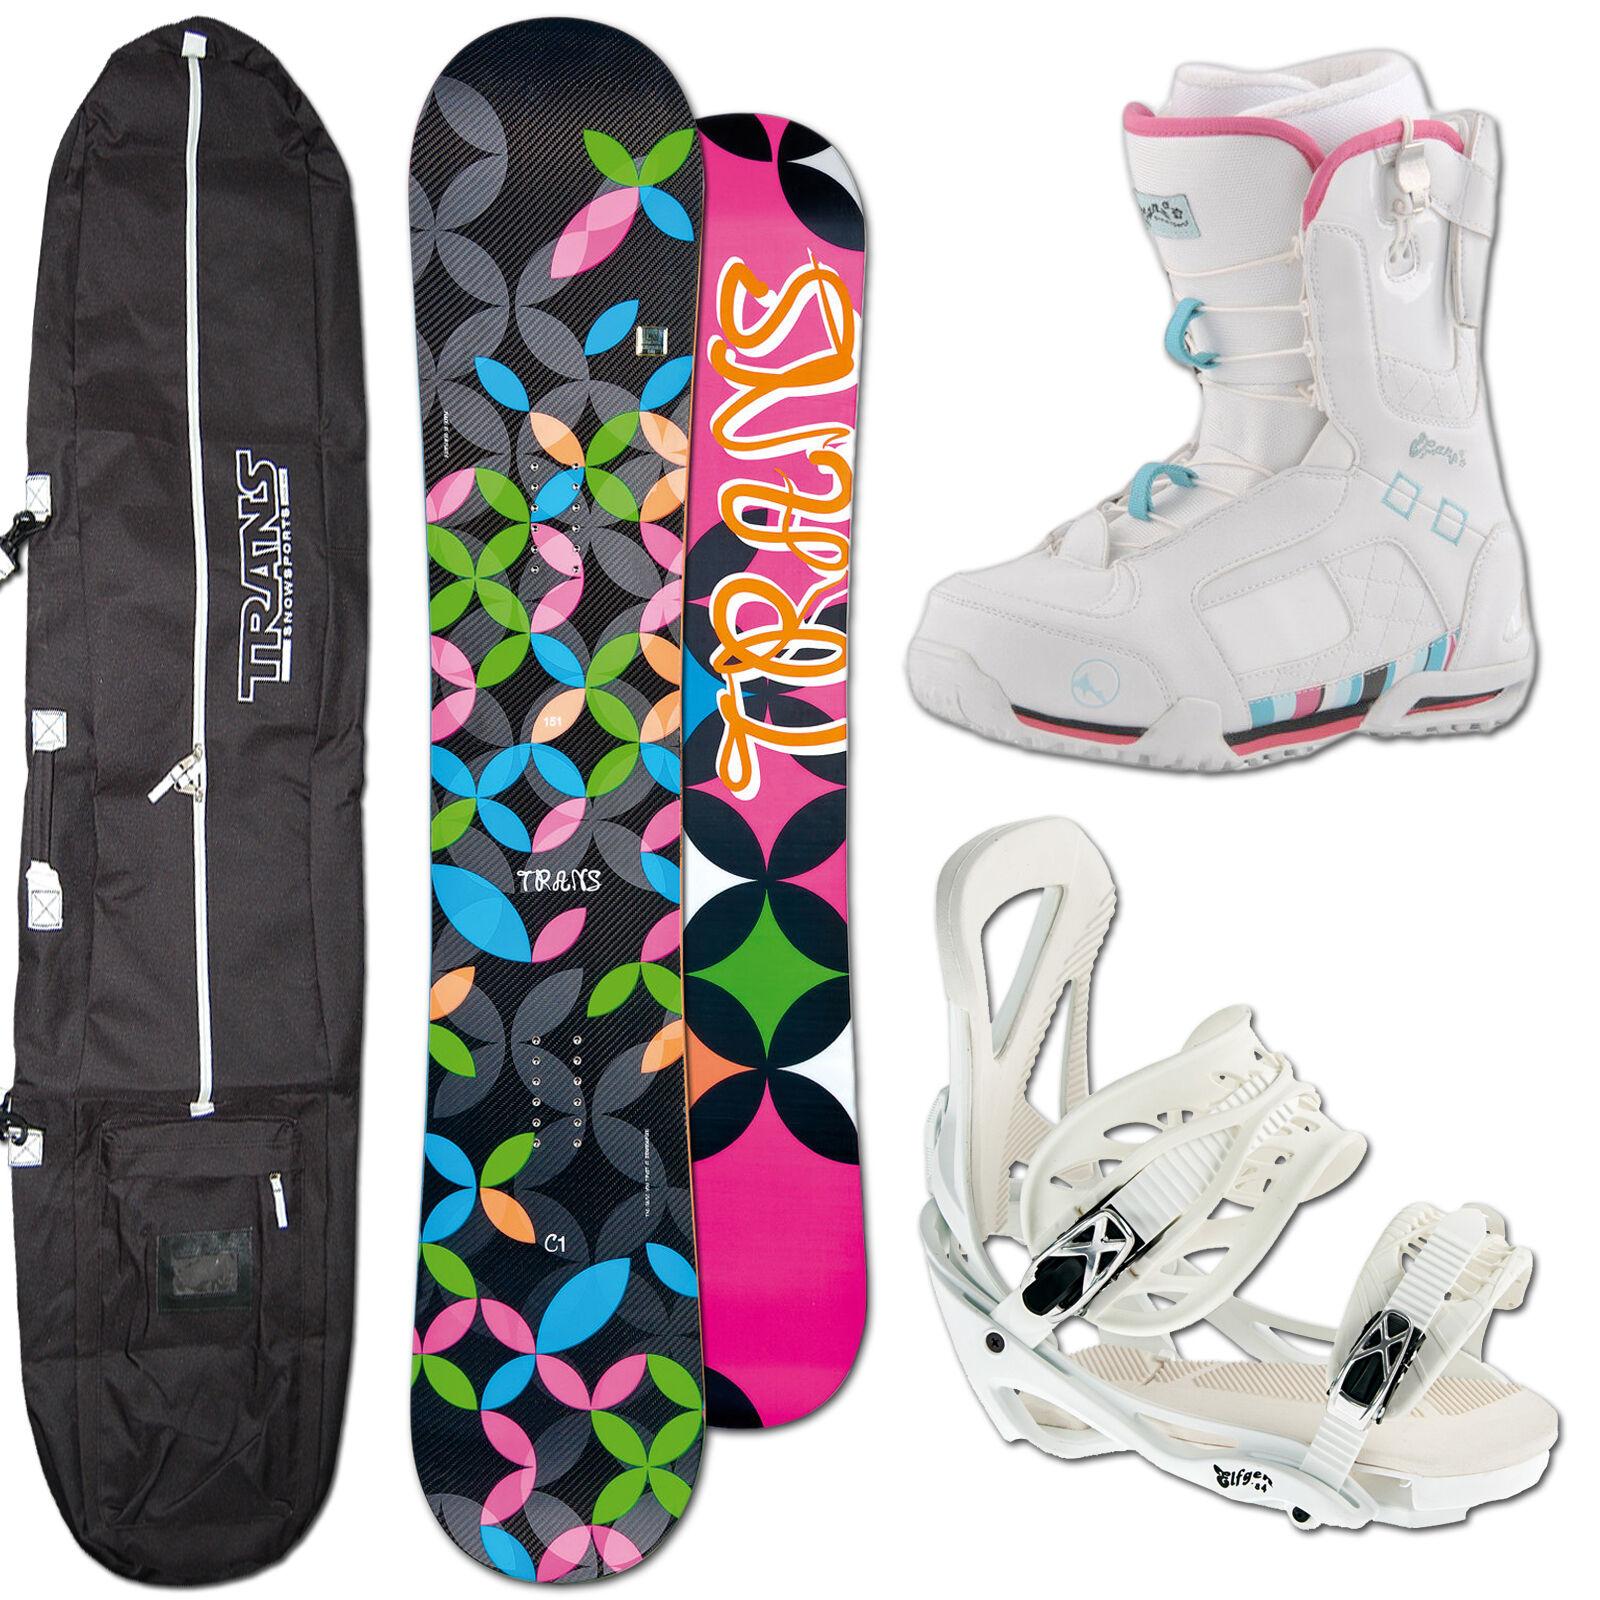 DAMEN SNOWBOARD  TRANS C1 CARBON 148 CM + ELFGEN TEAM BINDUNG M + BOOTS + BAG